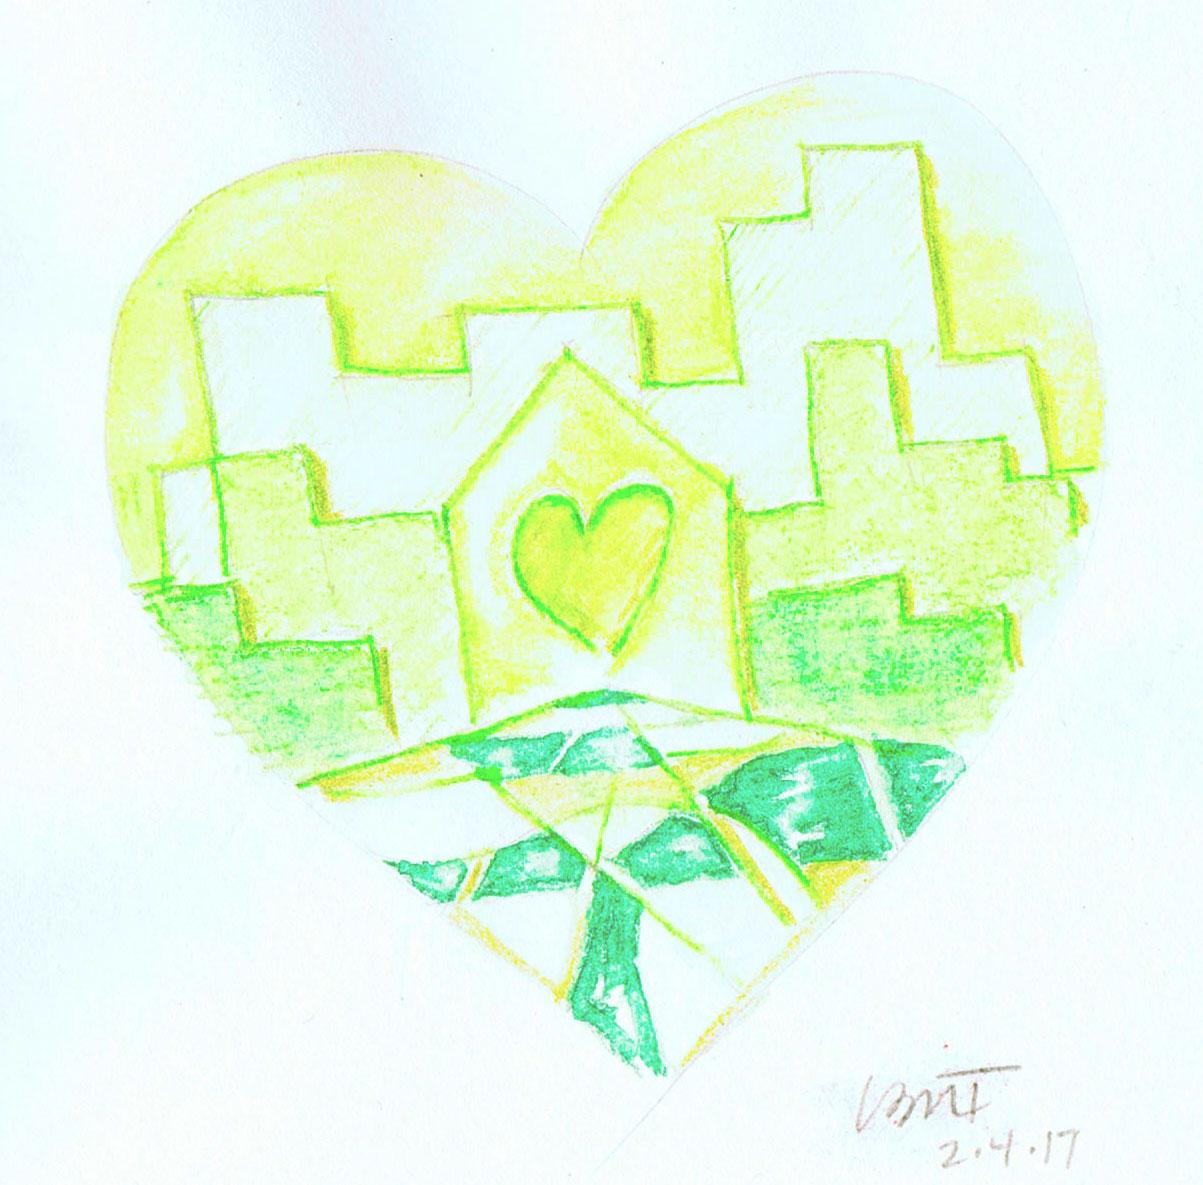 Green-Heart-Town-watercolor-pencil-mod